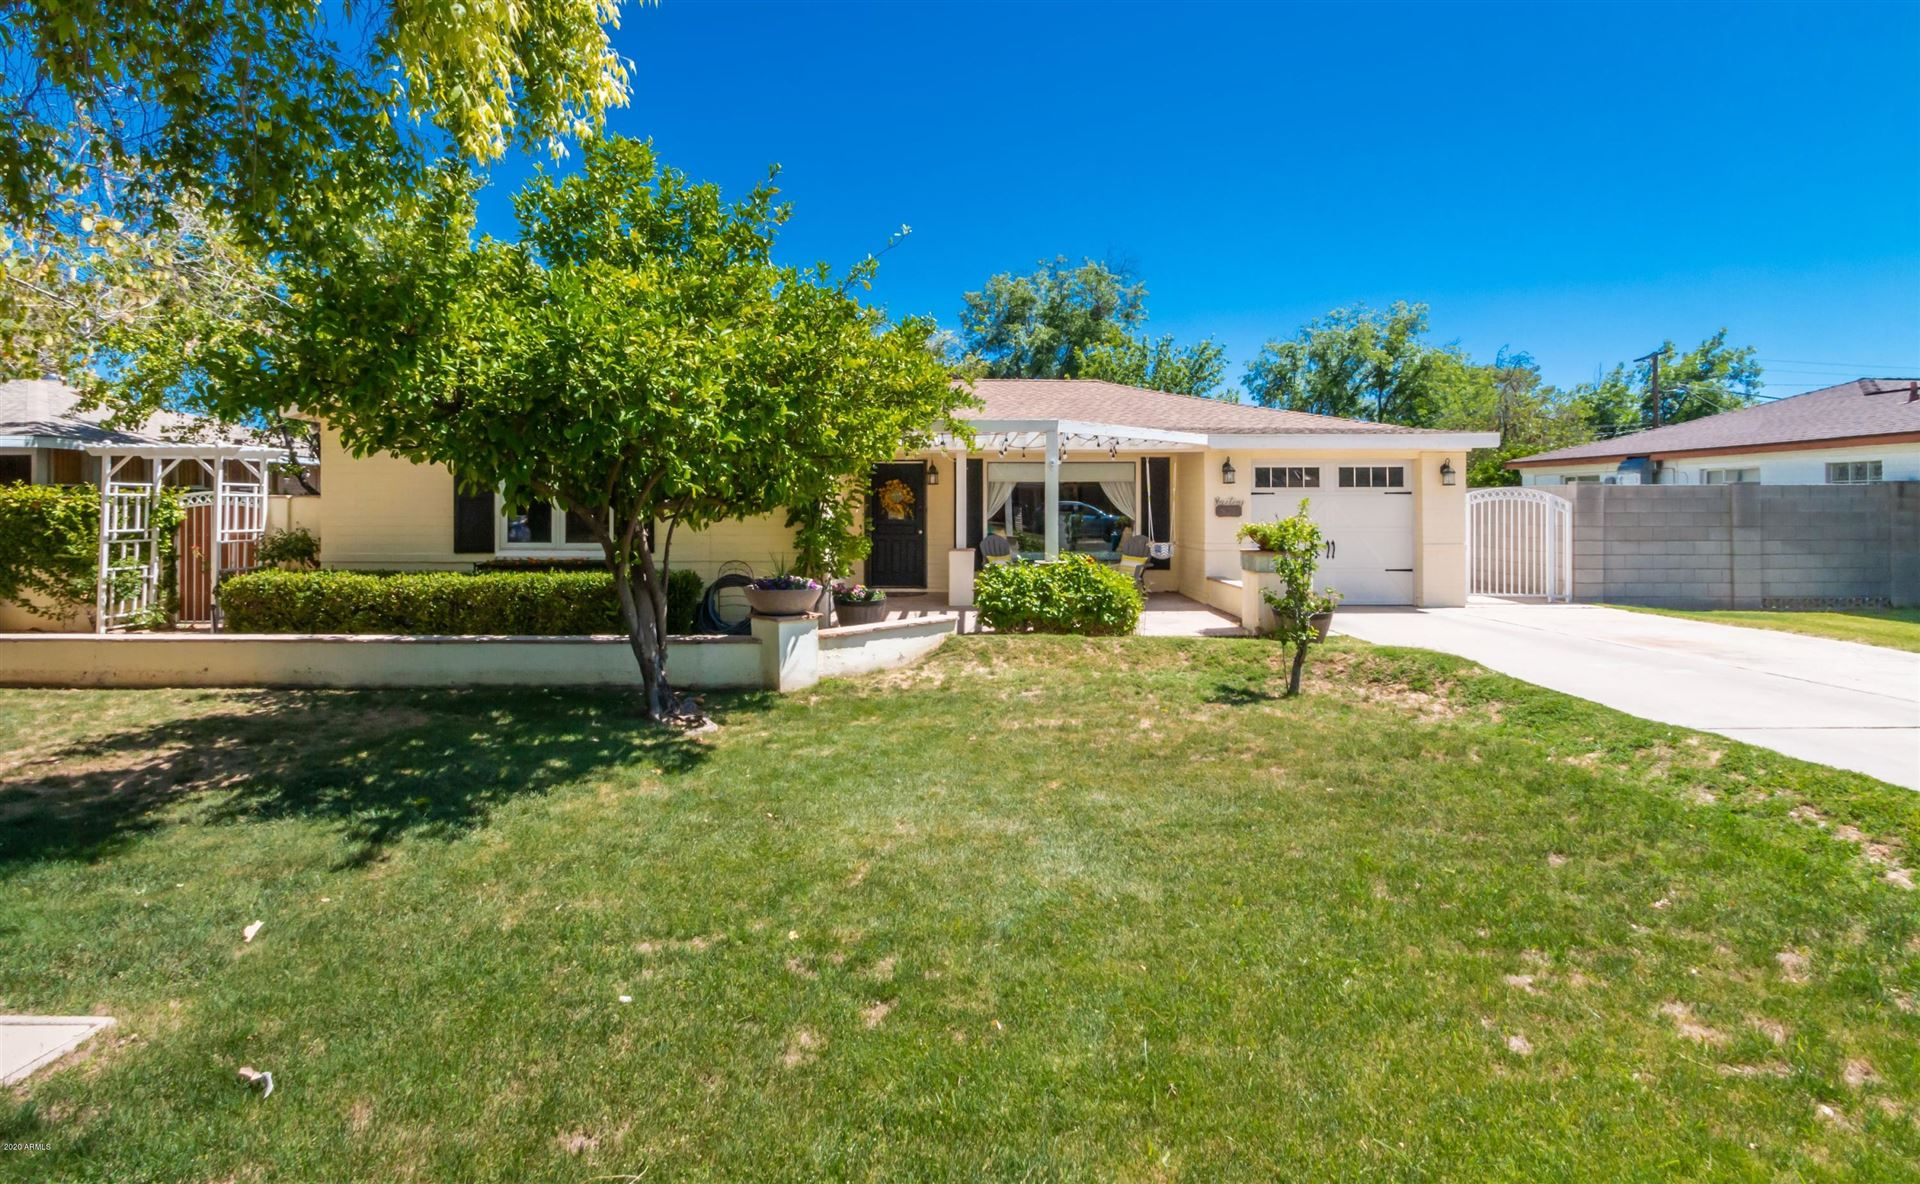 Property Image Of 825 W Orangewood Avenue In Phoenix, Az